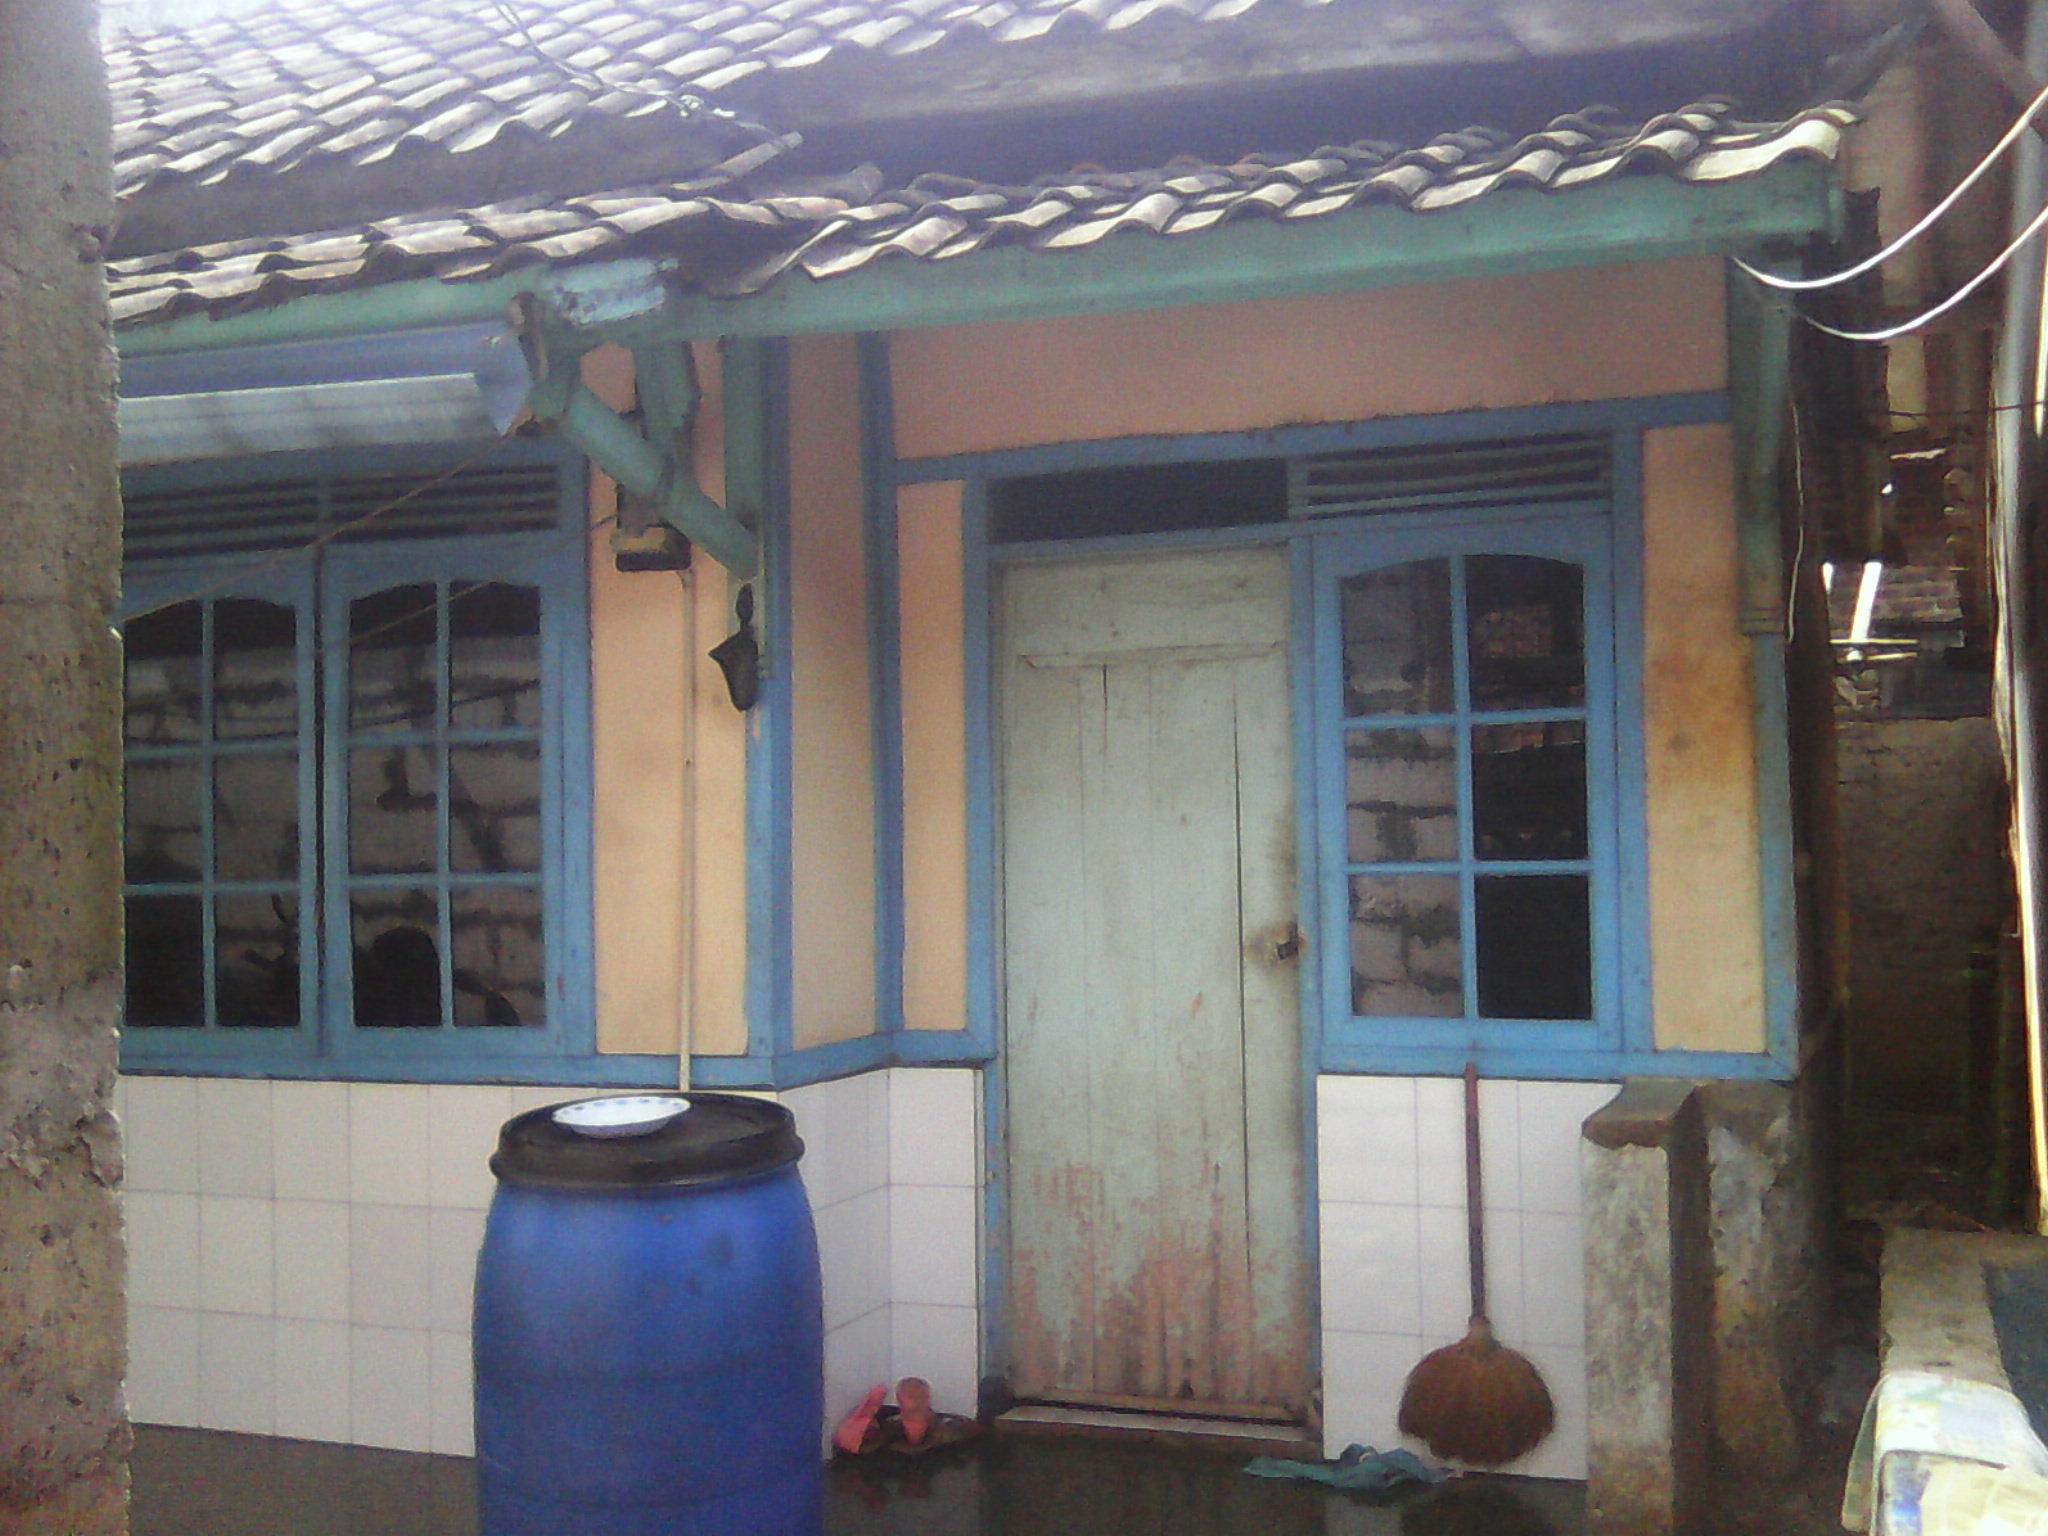 Rumah  Sederhana Semi  Permanen  Dekat Ke Jalan Raya Rumah